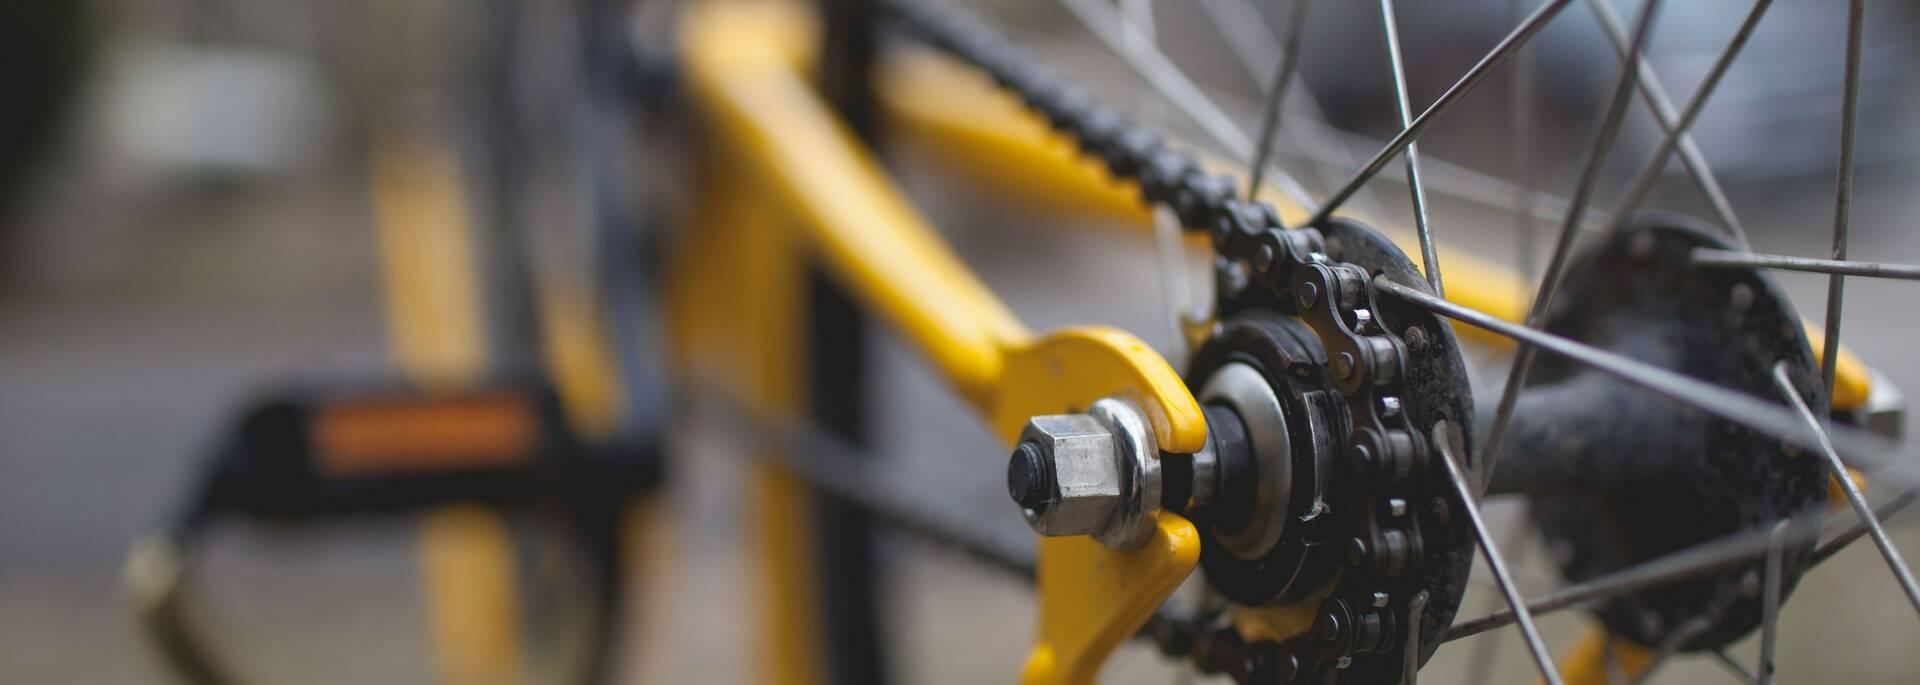 Repair your bike in Angers - © Chris Becker - Unsplash